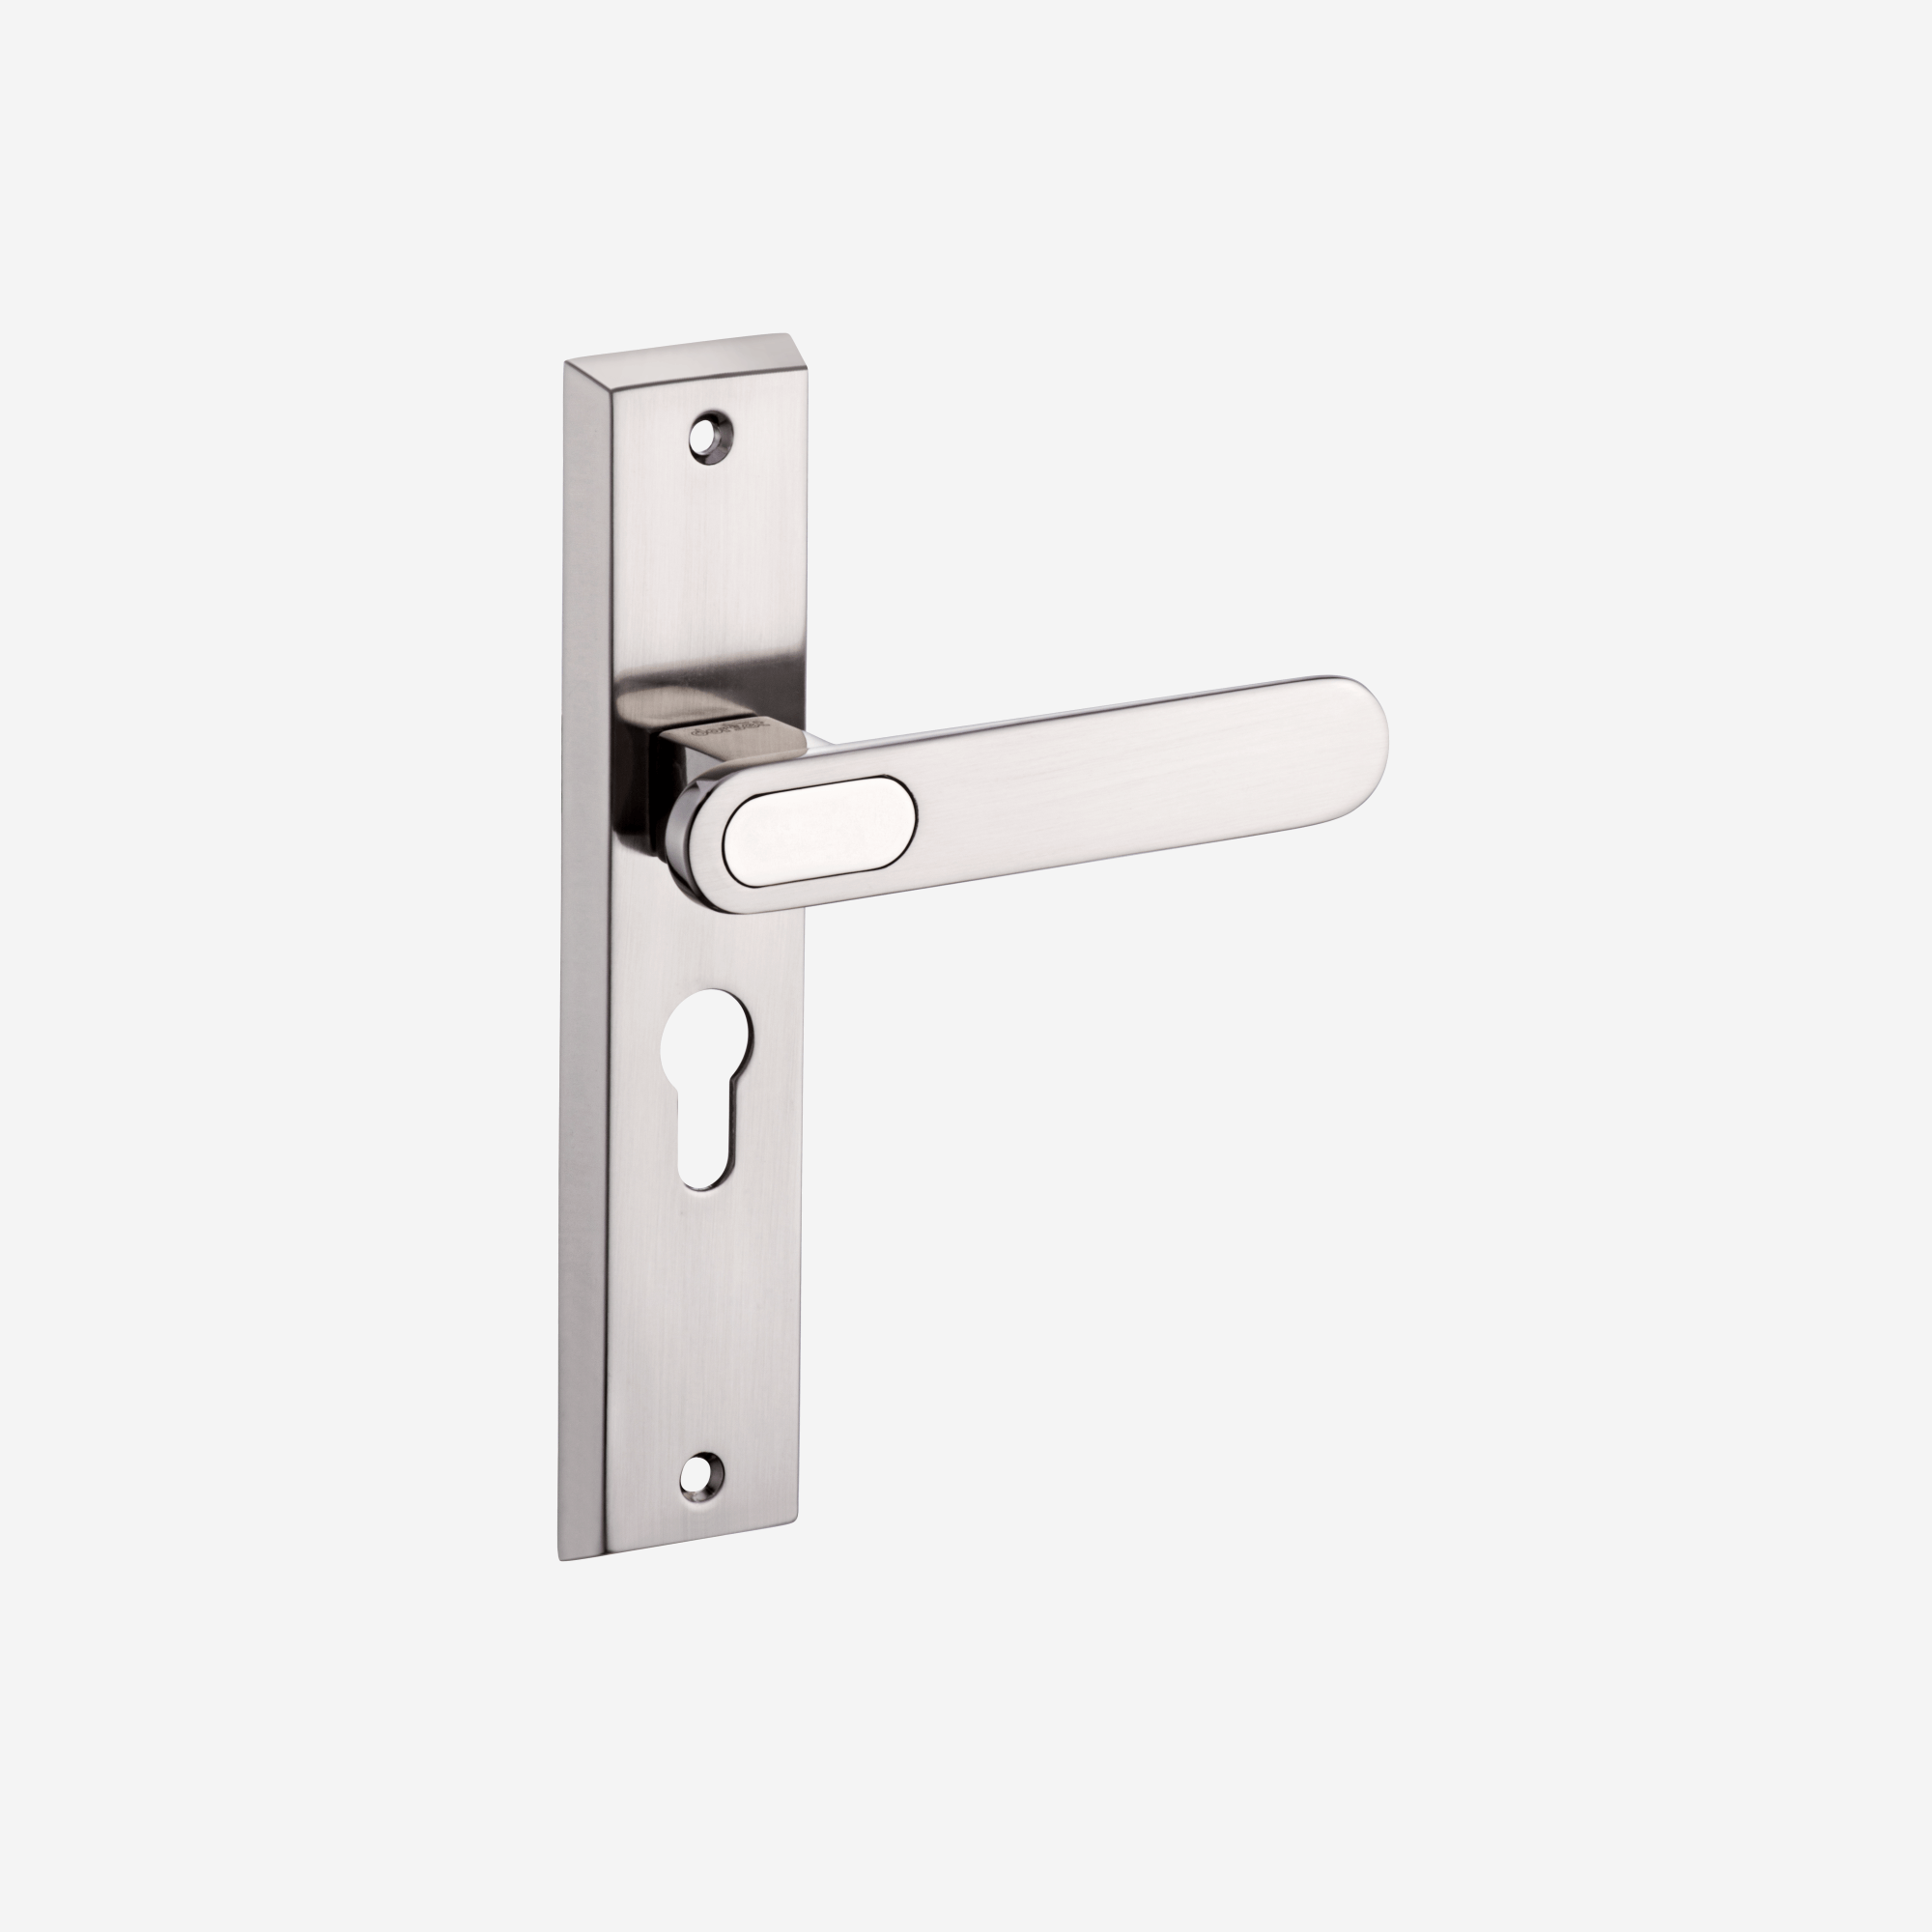 Door Security Systems, Door Access Control Systems, Durable Lock